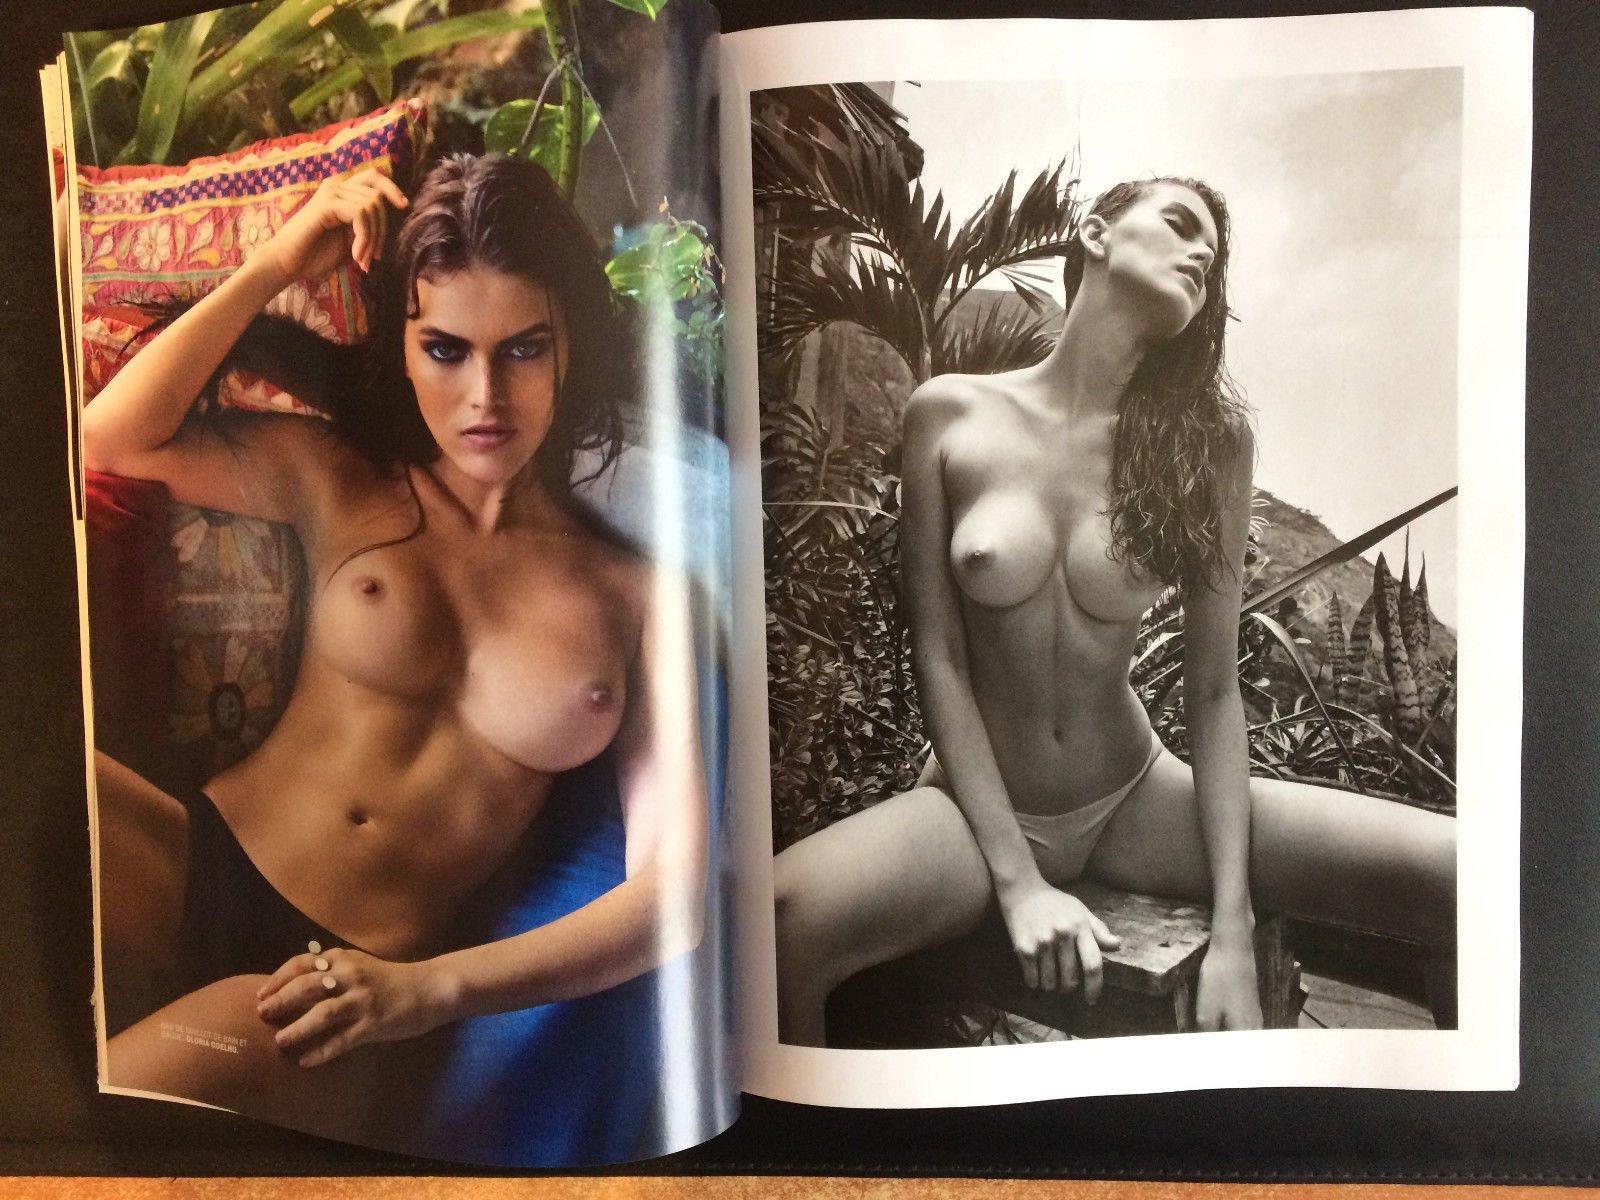 Kamila hansen topless - 2019 year